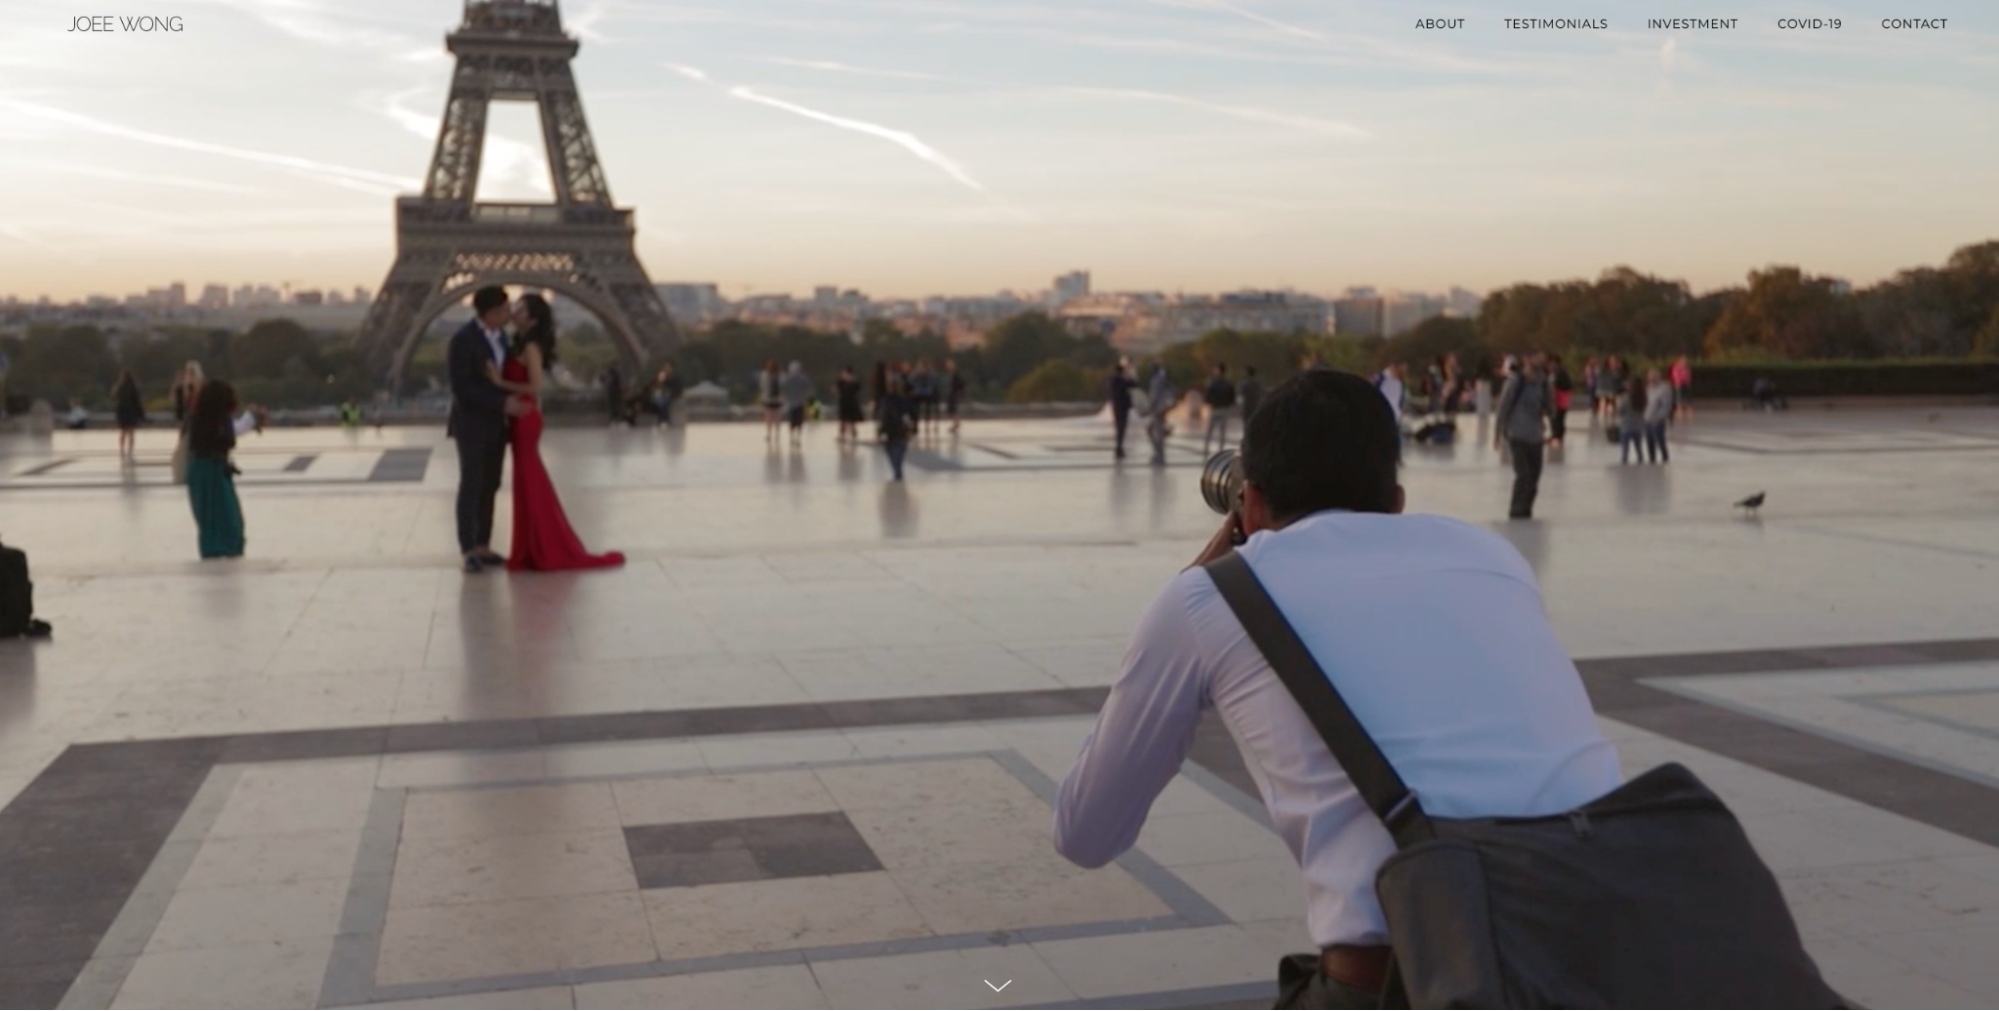 Wedding photography portfolio website.